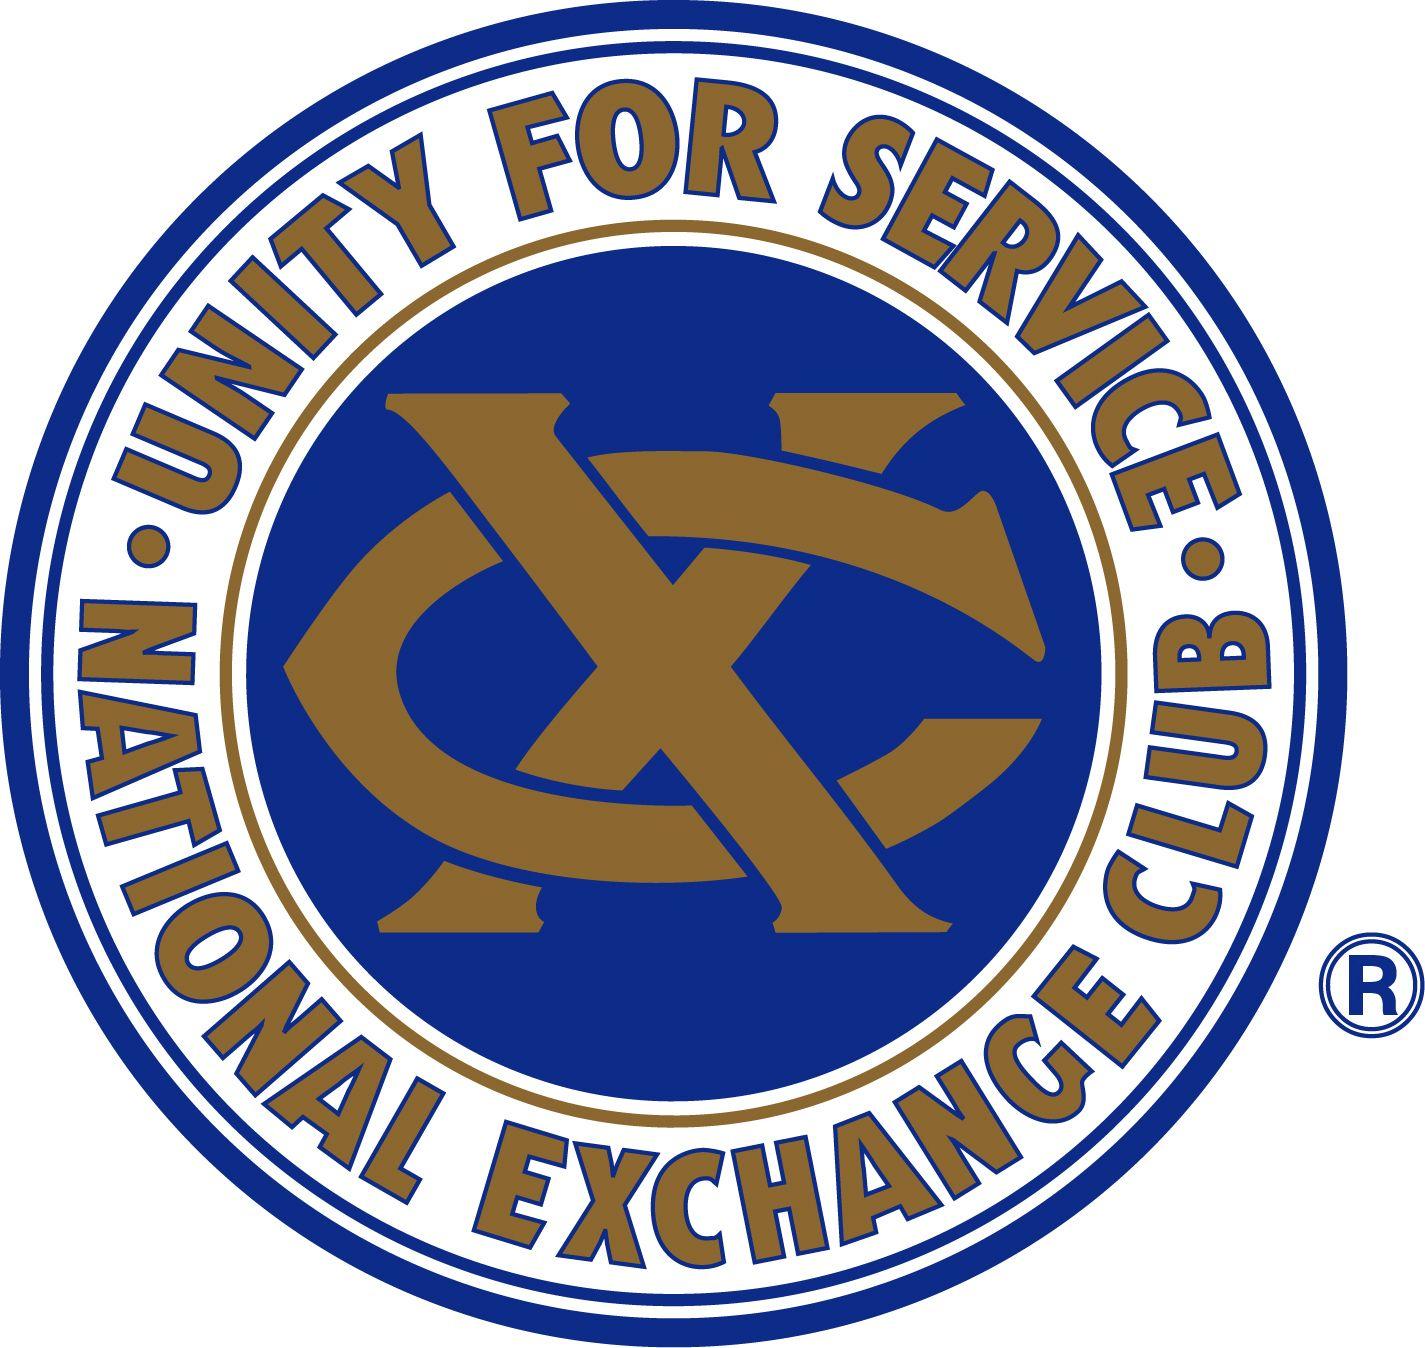 Sarasota Business Exchange Club